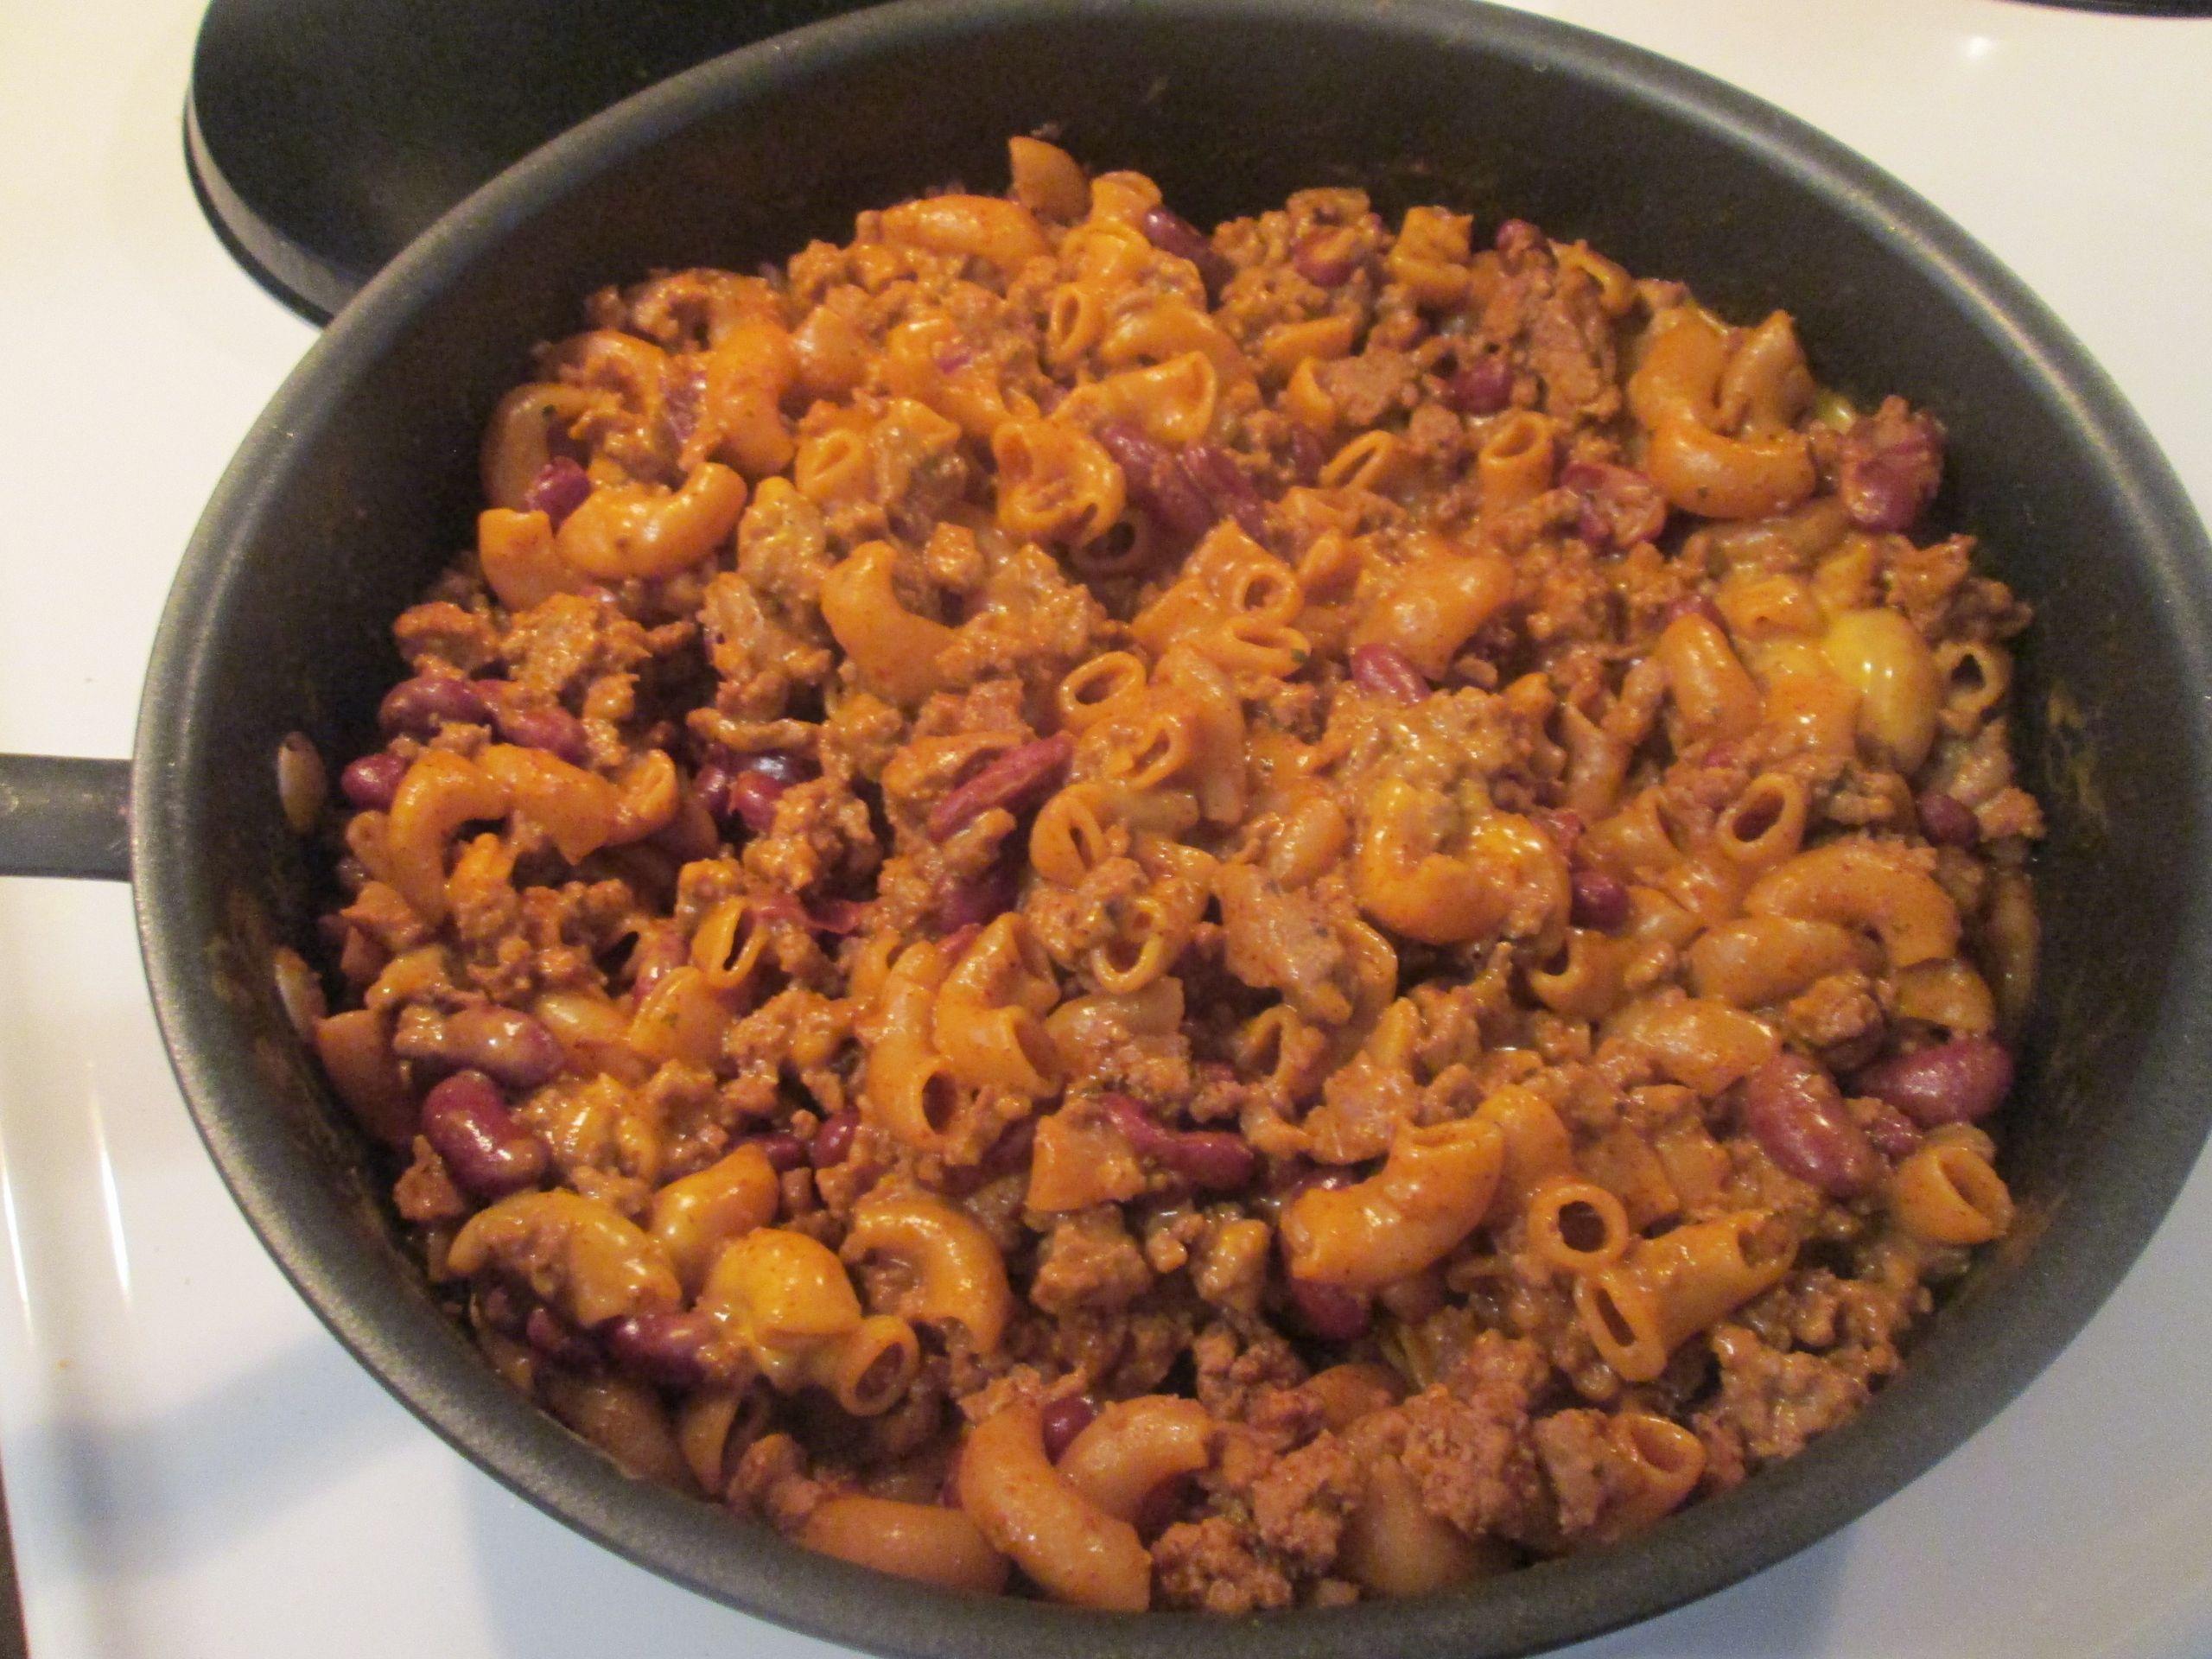 Velveeta Mac And Cheese Recipes With Ground Beef  macaroni and cheese with ground beef calories